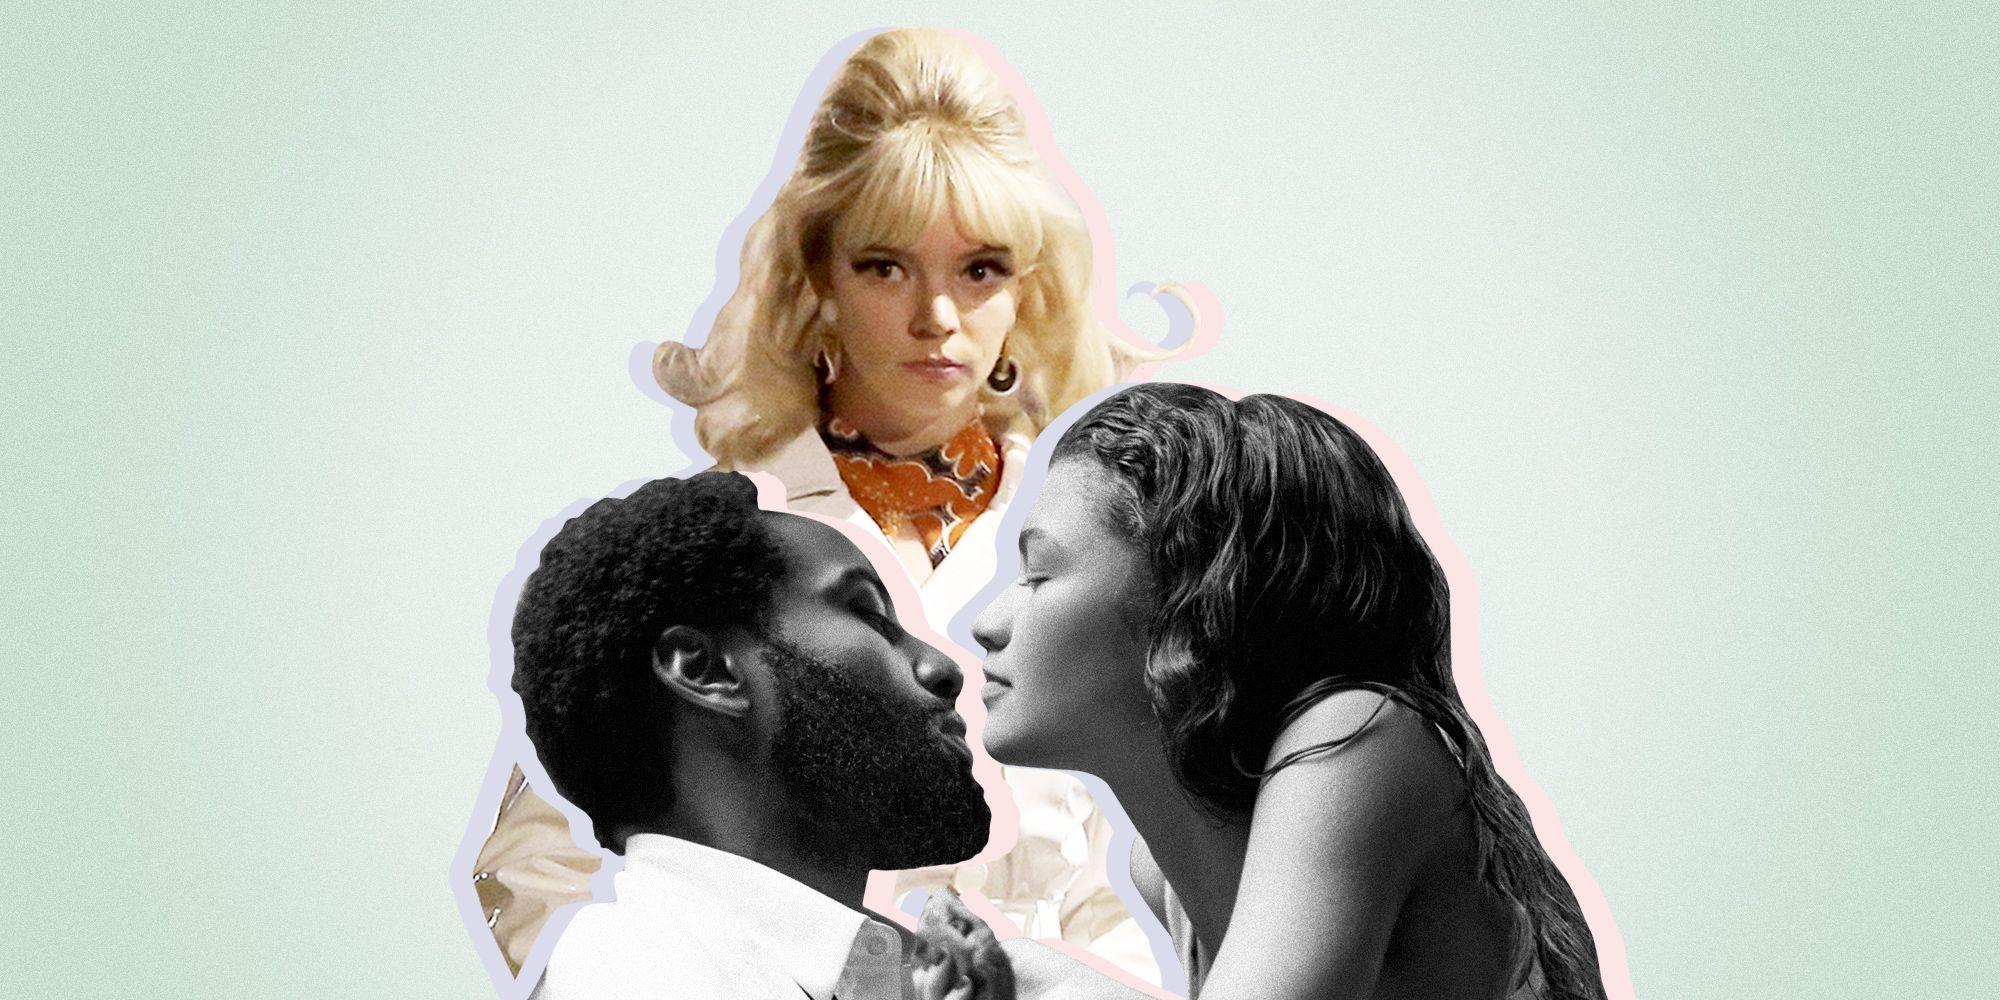 Erotic Scenes Of Open Marriage In Dramas